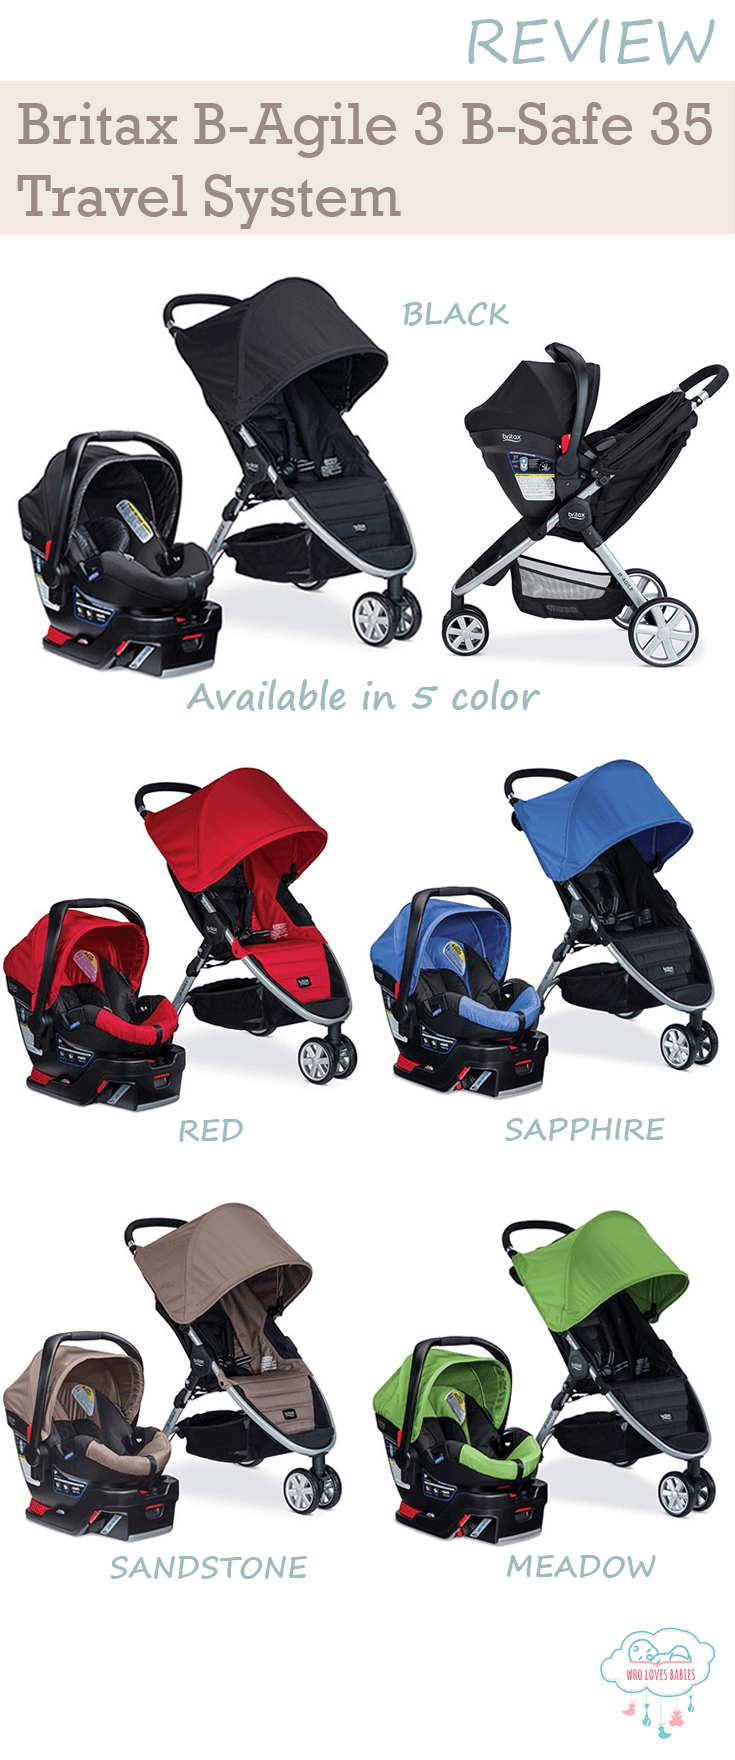 40++ Travel stroller system reviews ideas